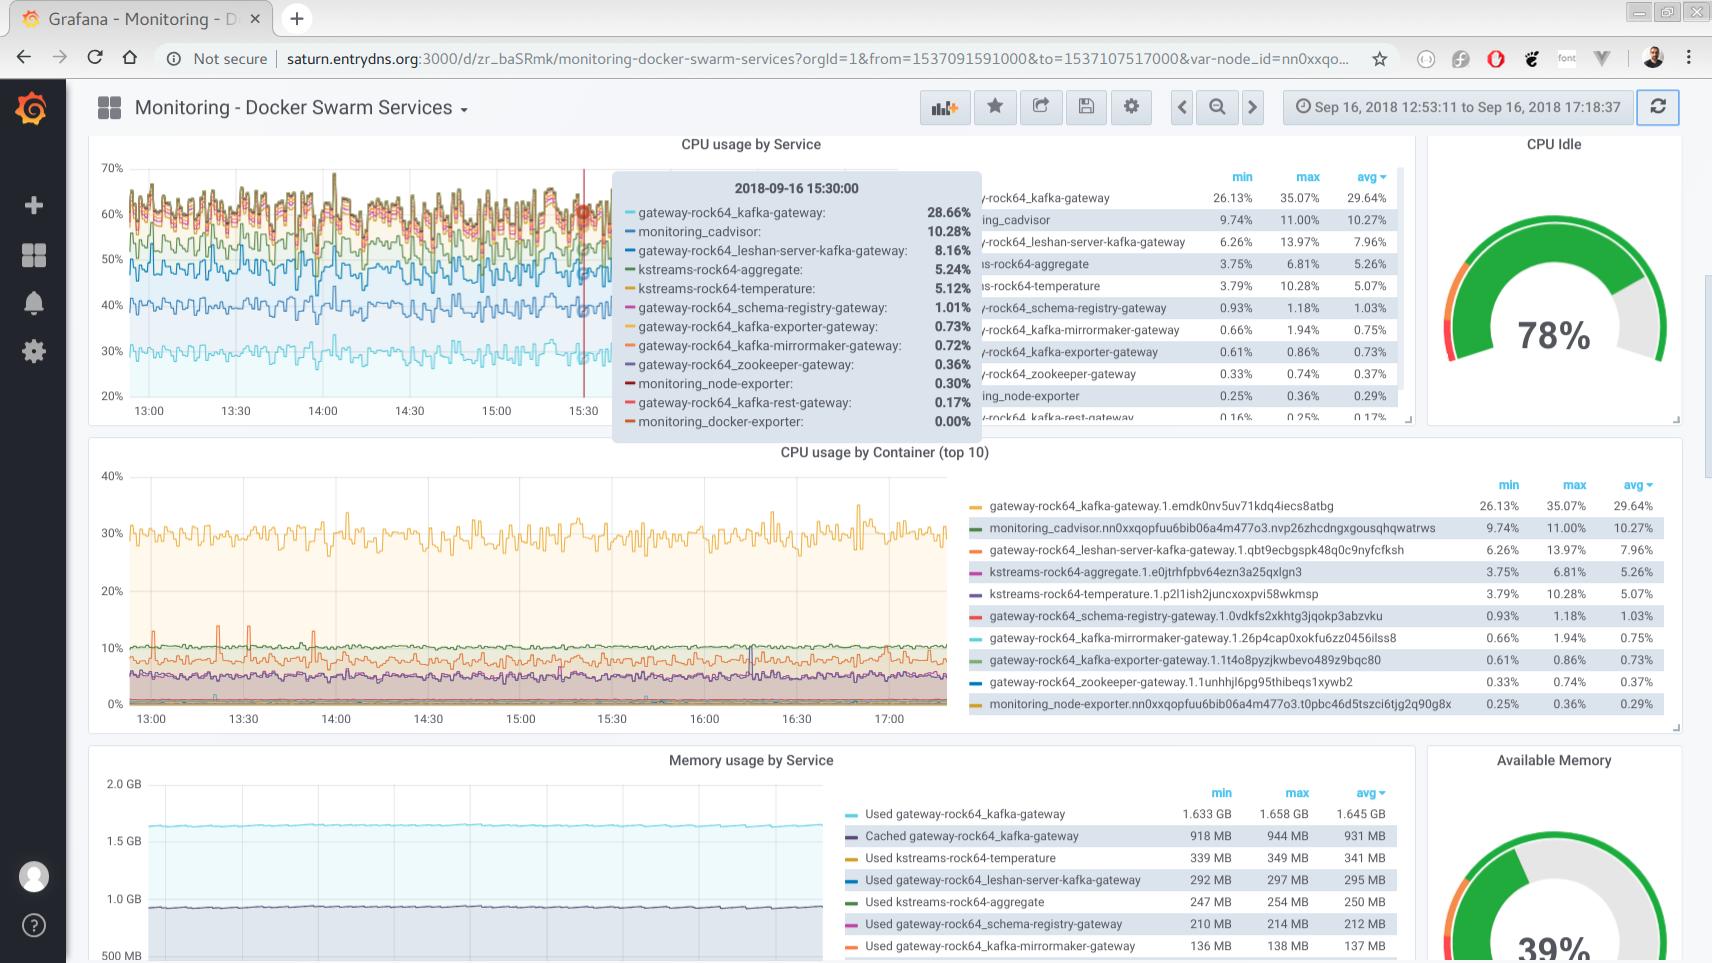 monitoring_docker_swarm_services_2